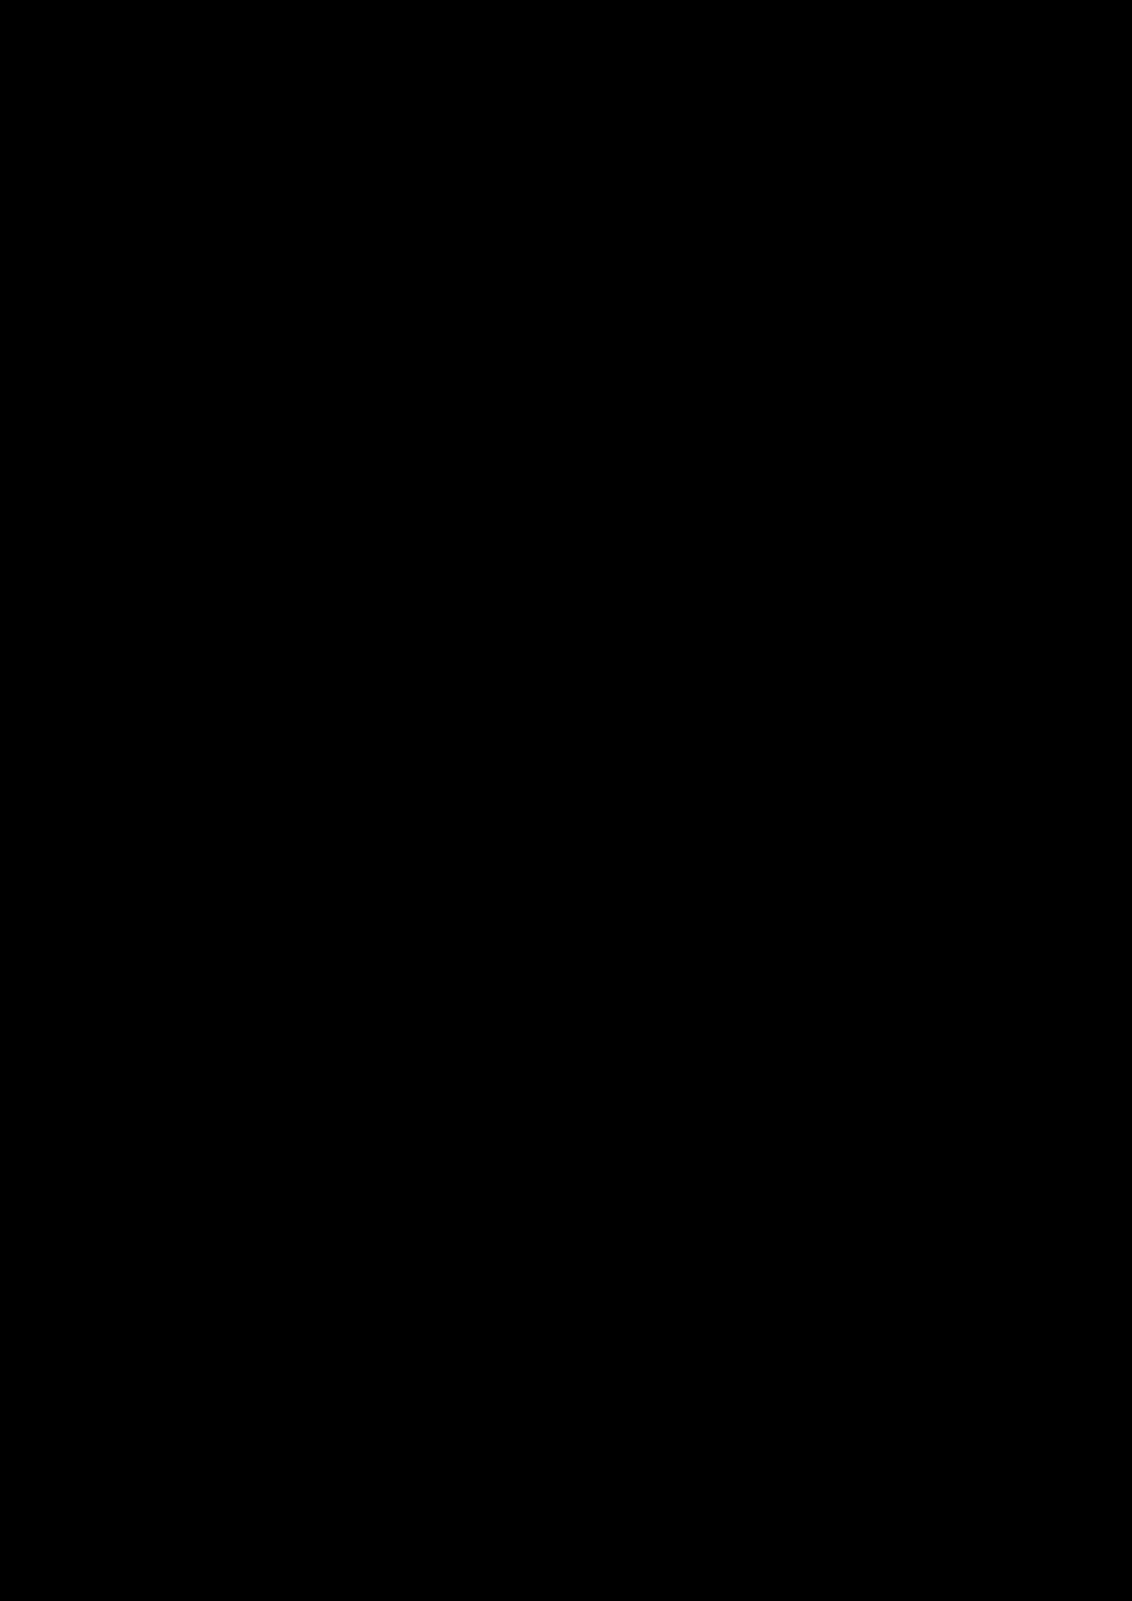 N.A.S.T.YA slide, Image 33